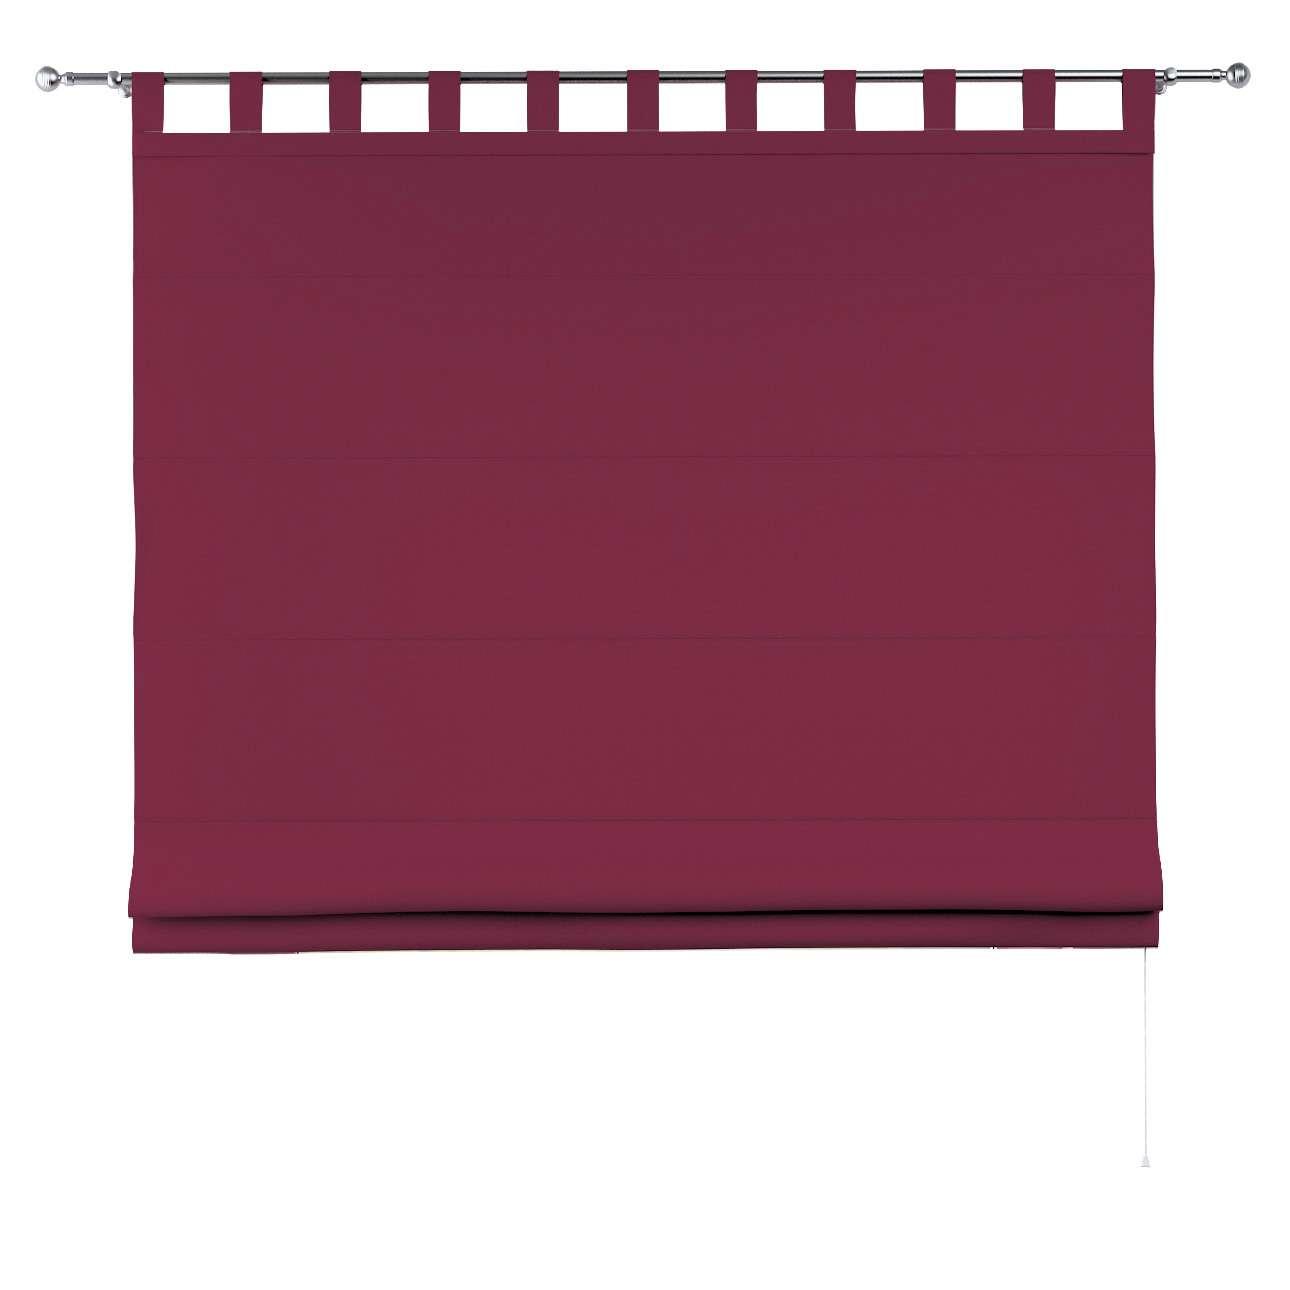 Rímska roleta Verona 80 x 170 cm V kolekcii Cotton Panama, tkanina: 702-32